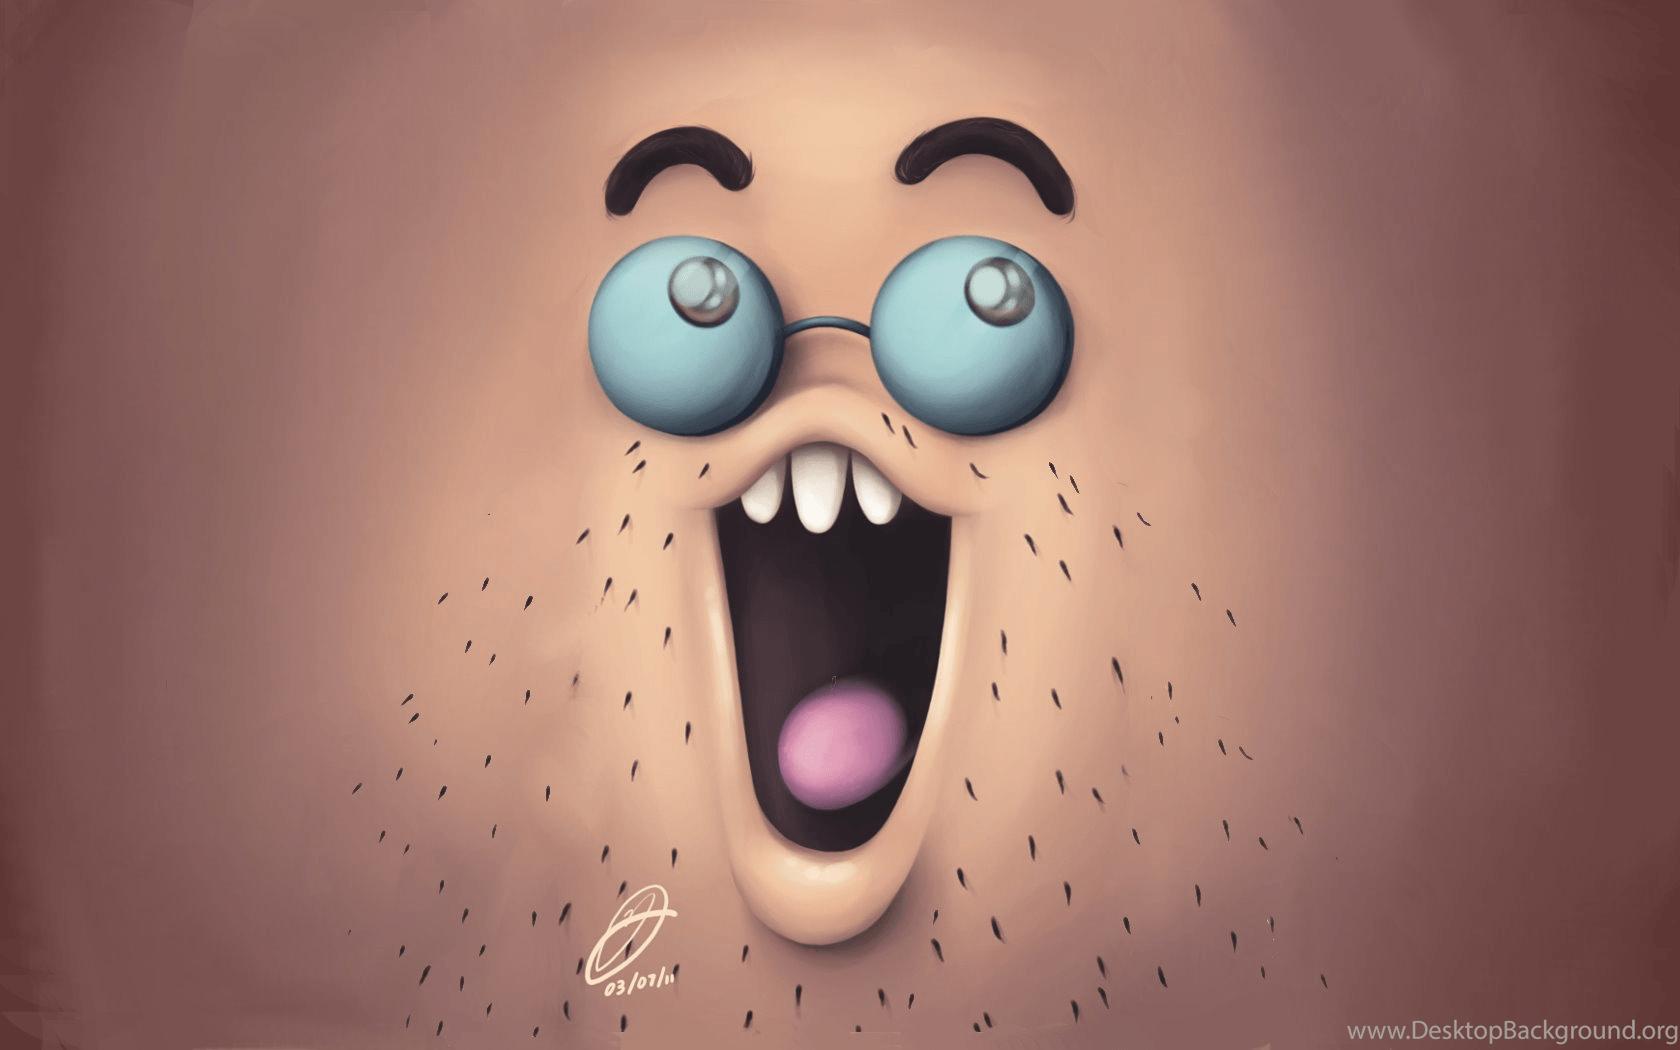 Funny Cartoon Face Wallpapers Top Free Funny Cartoon Face